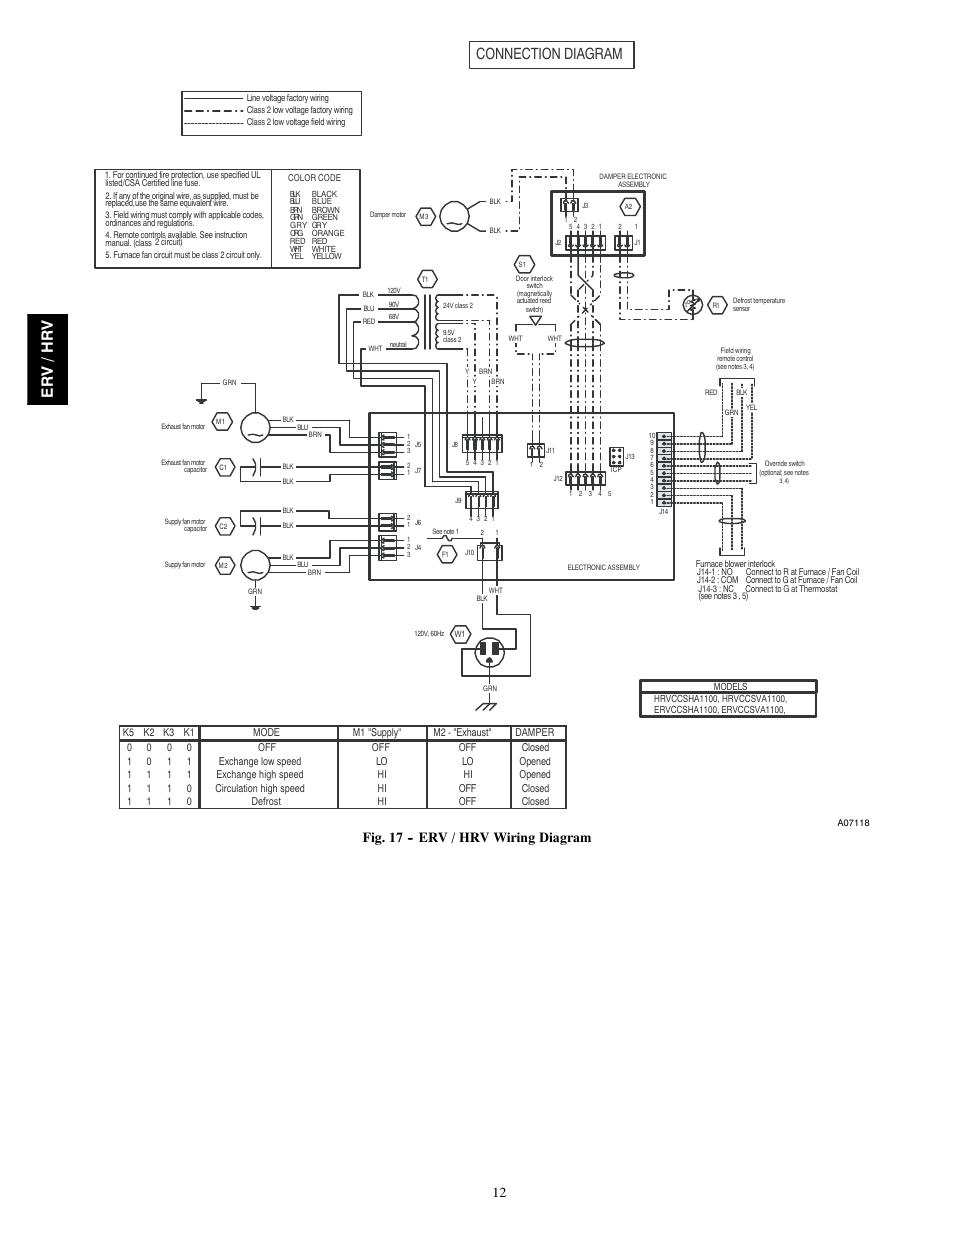 hight resolution of 17 erv hrv wiring diagram bryant energy heat recovery ventilator ervbbsva1100 user manual page 12 13